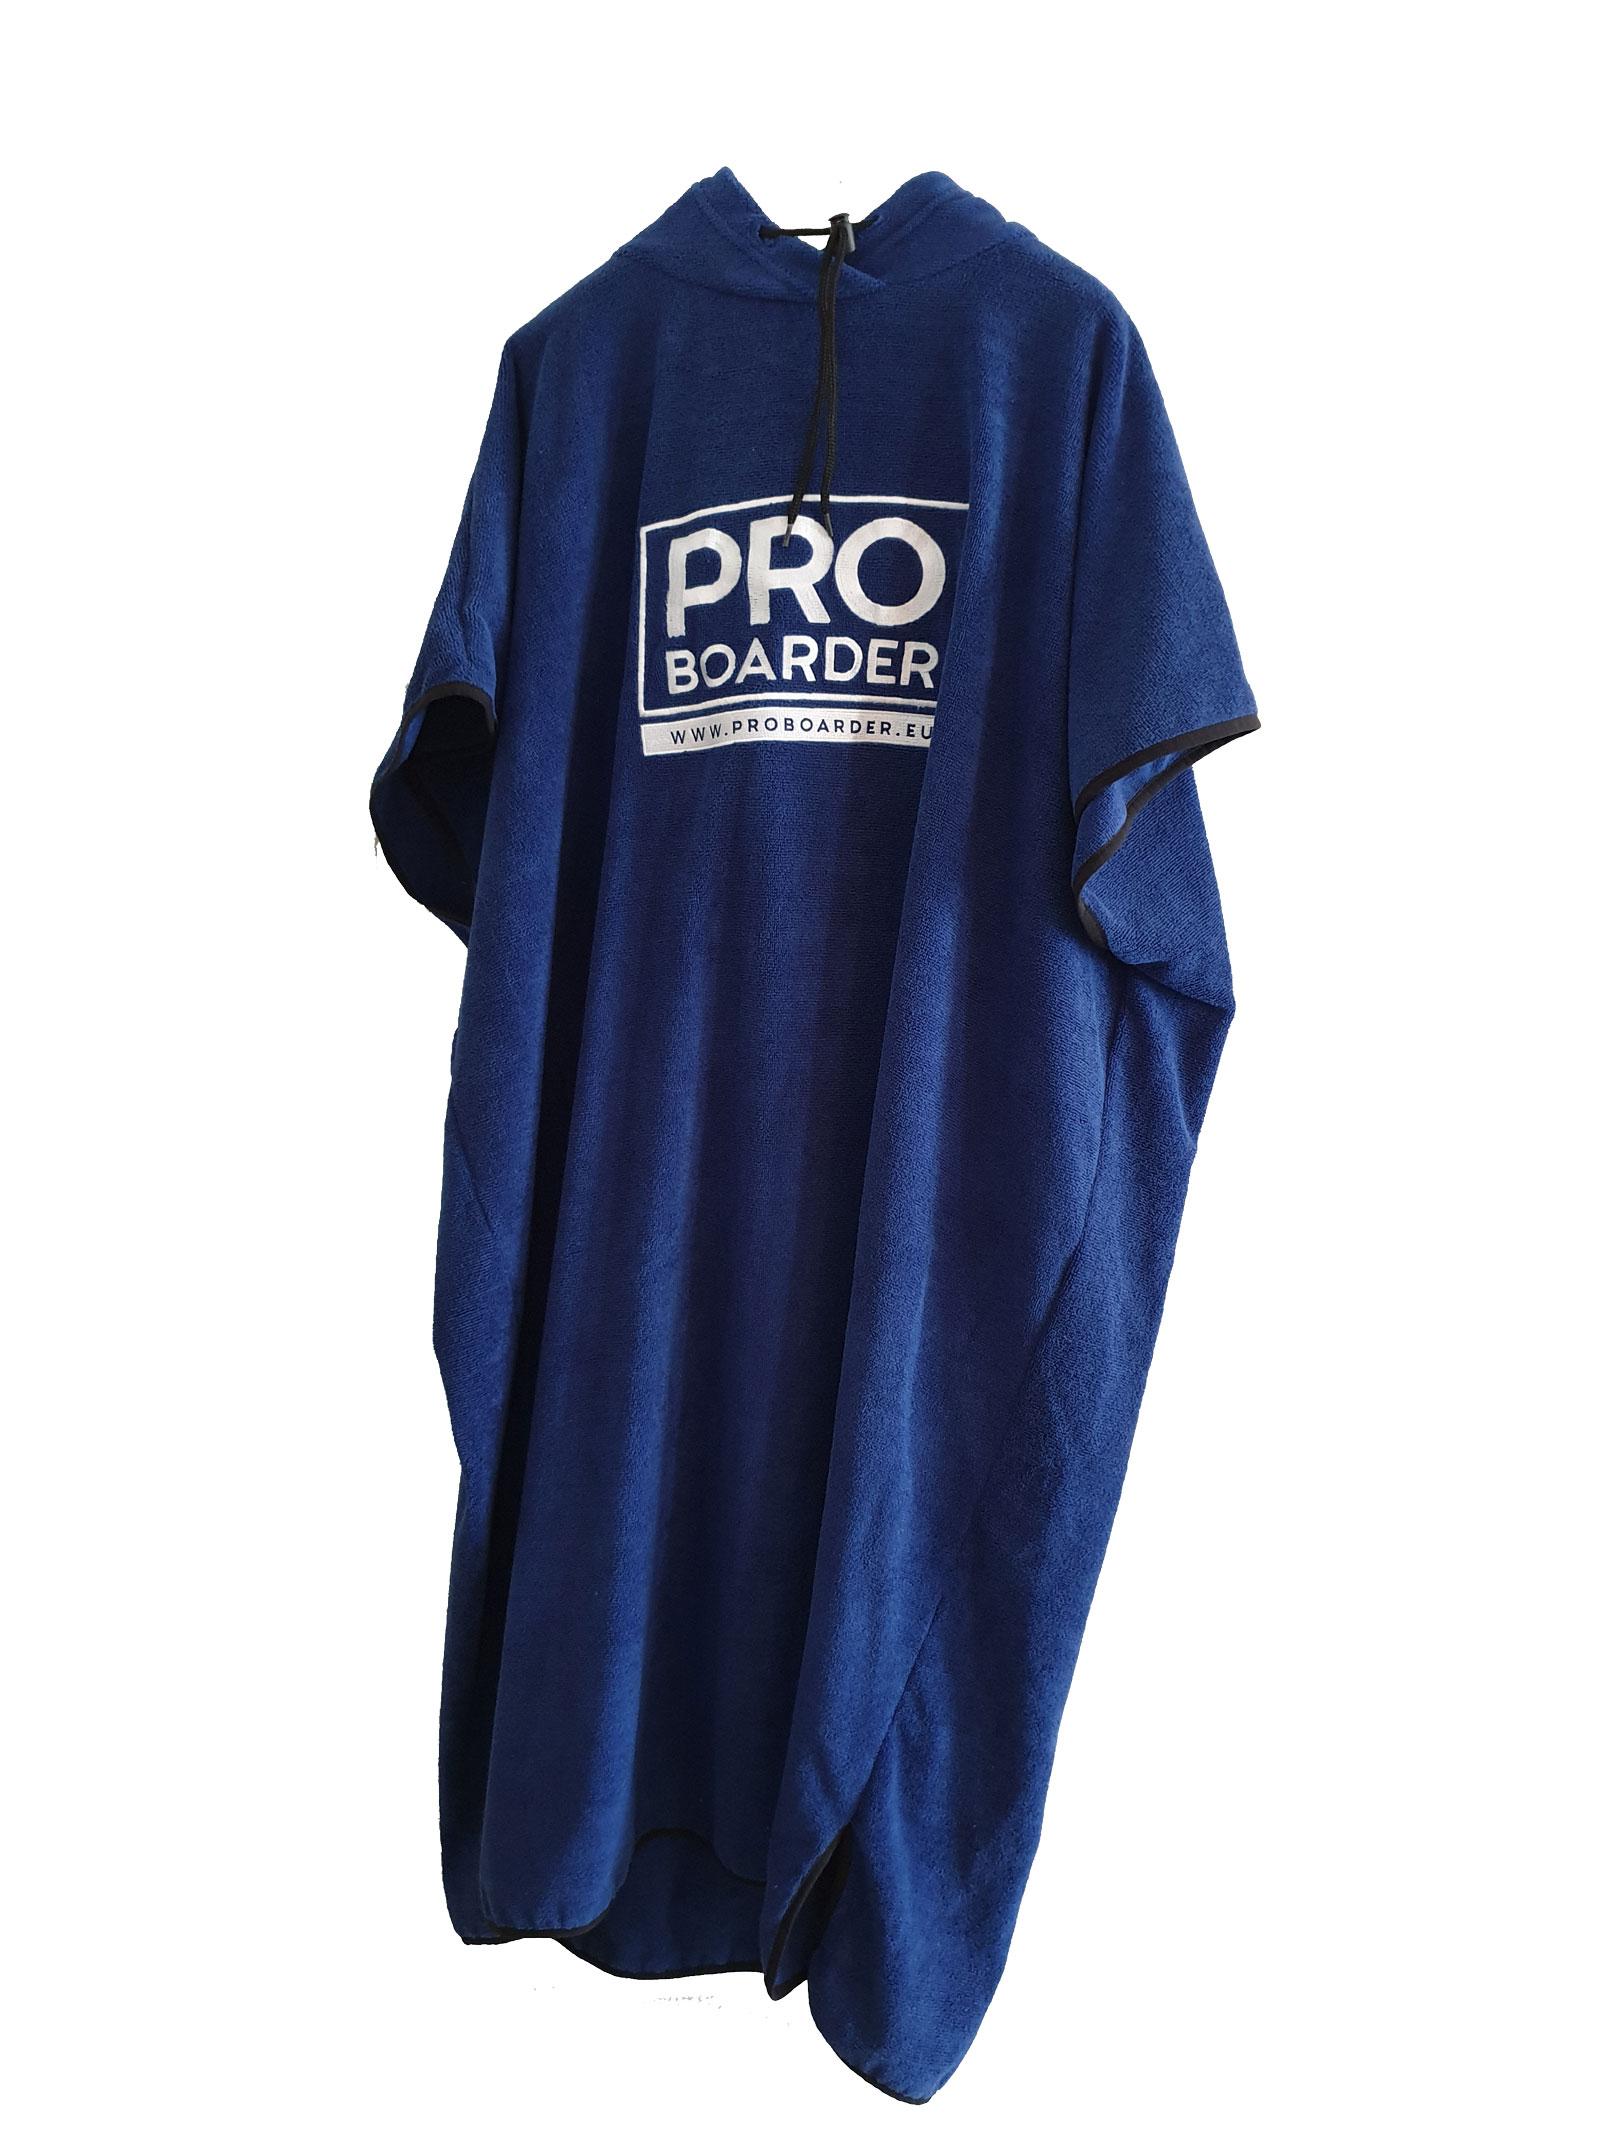 Poncho / Umkleide-Handtuch / Handtuchponcho PROBOARDER